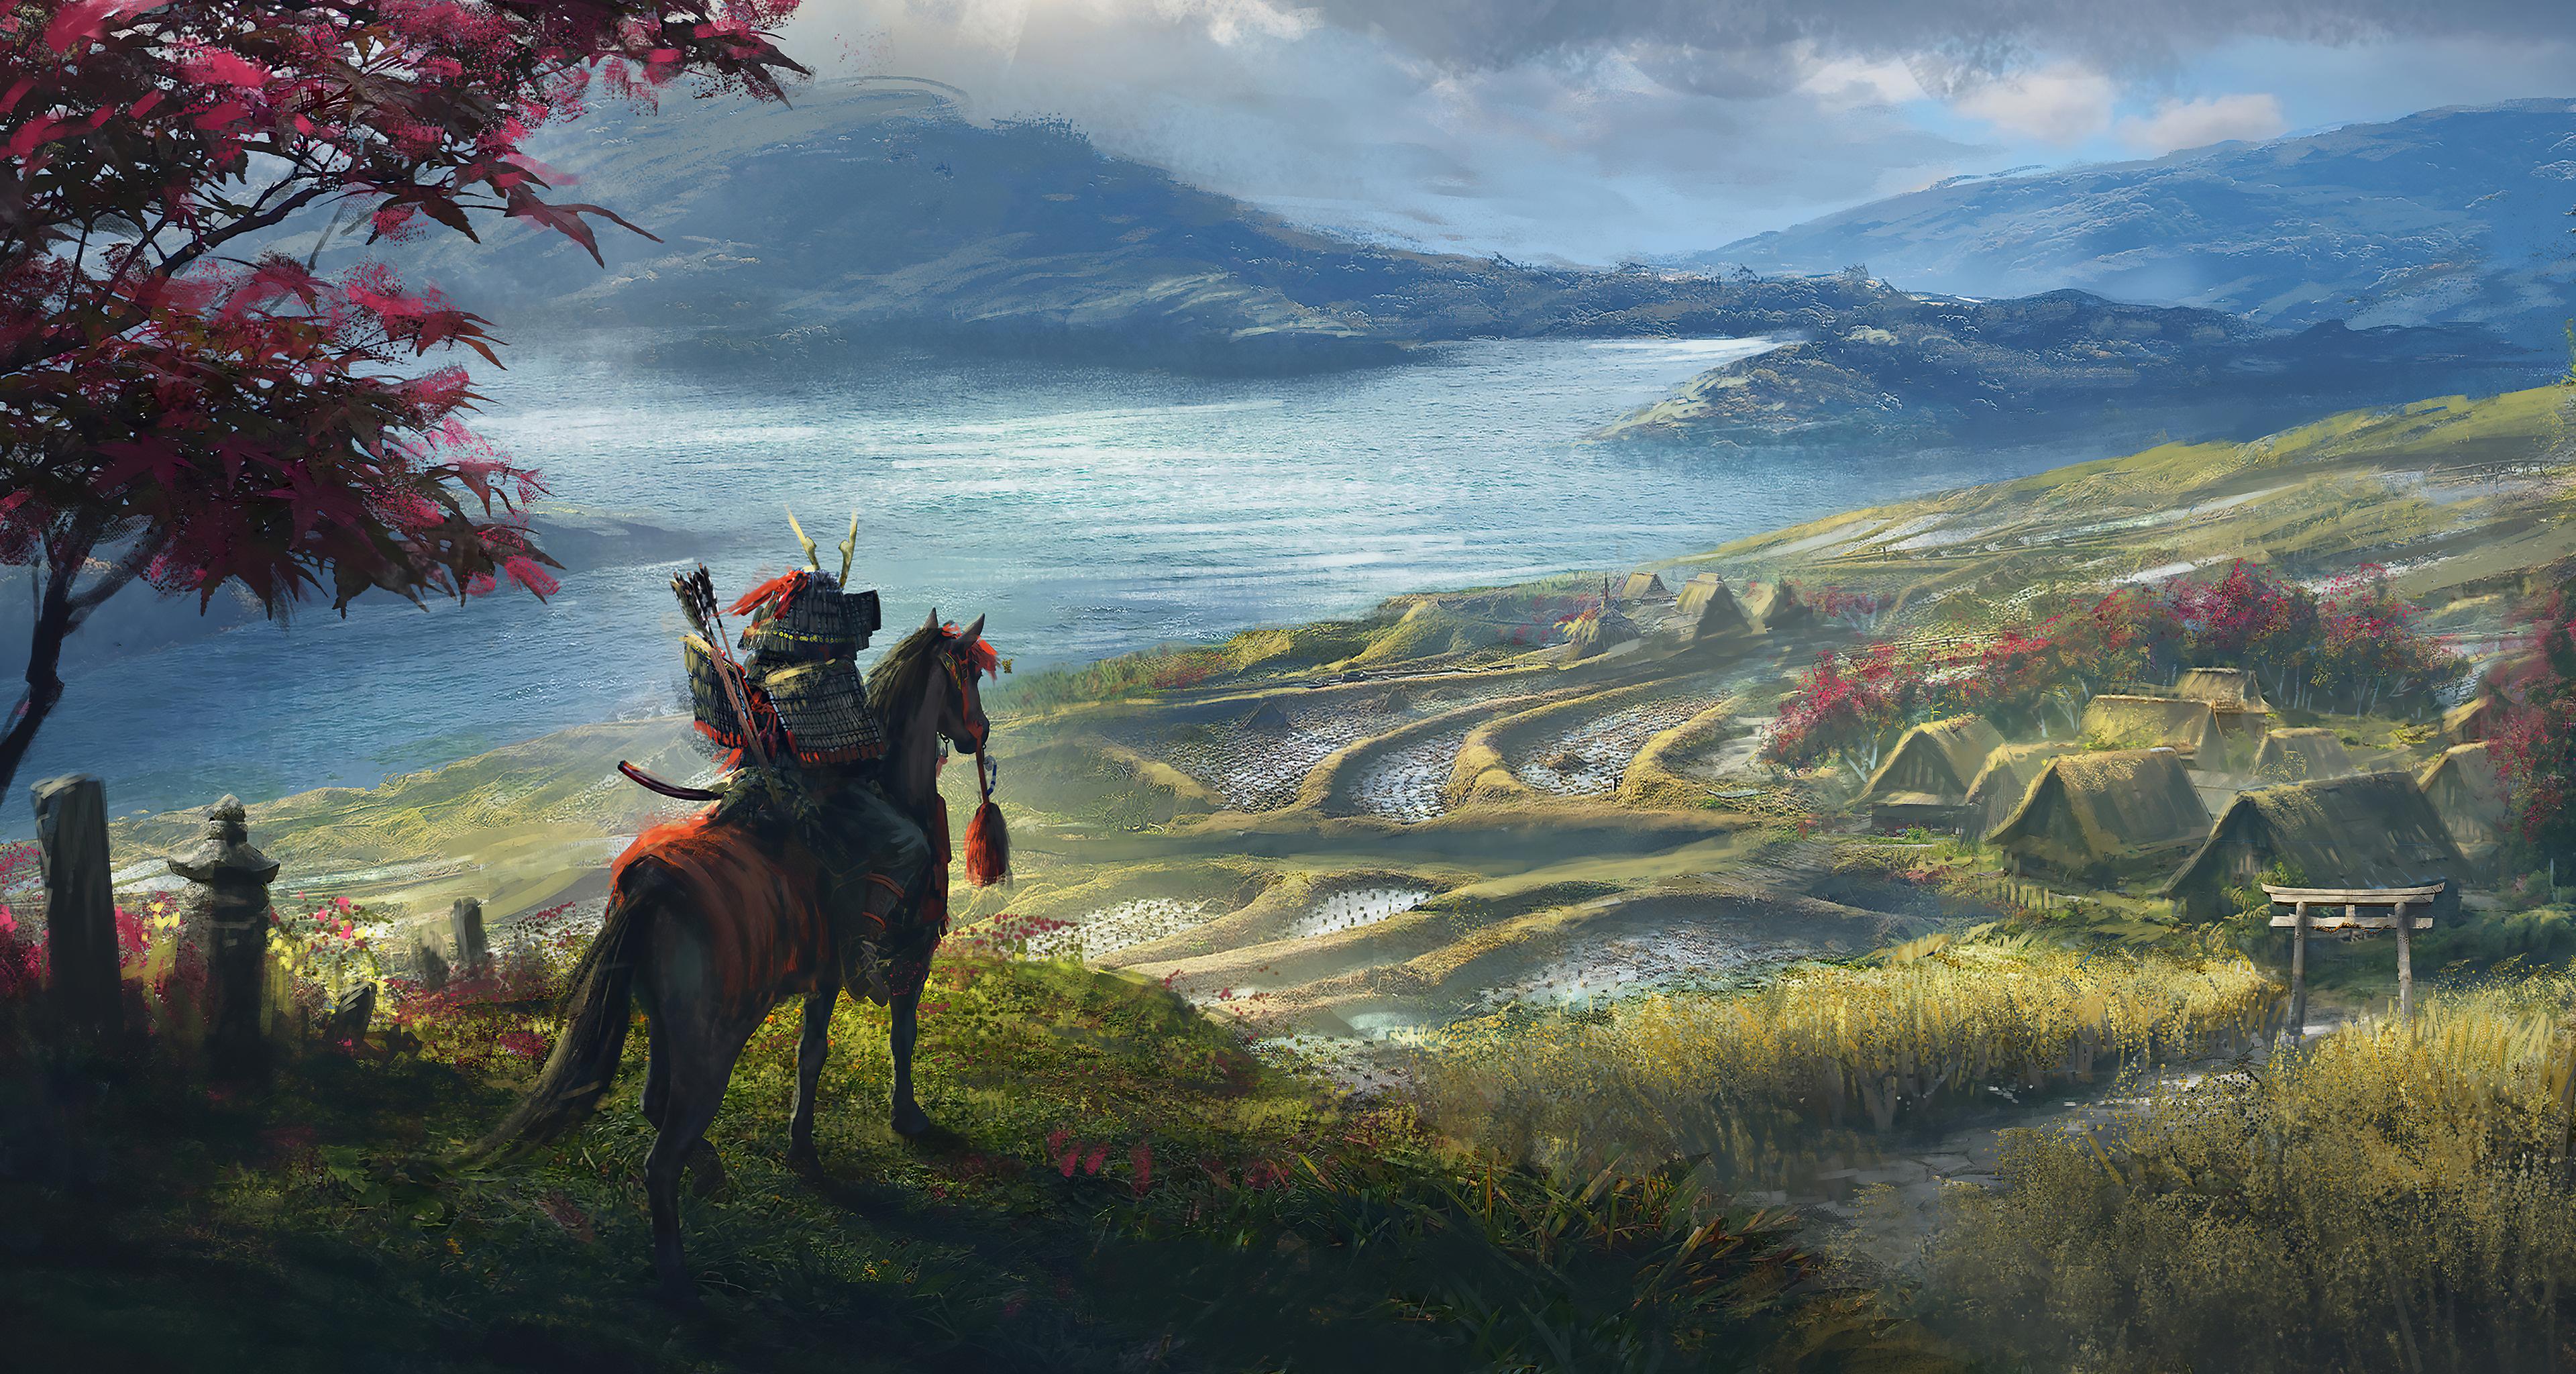 General 3840x2048 artwork fantasy art samurai nature landscape rice fields village